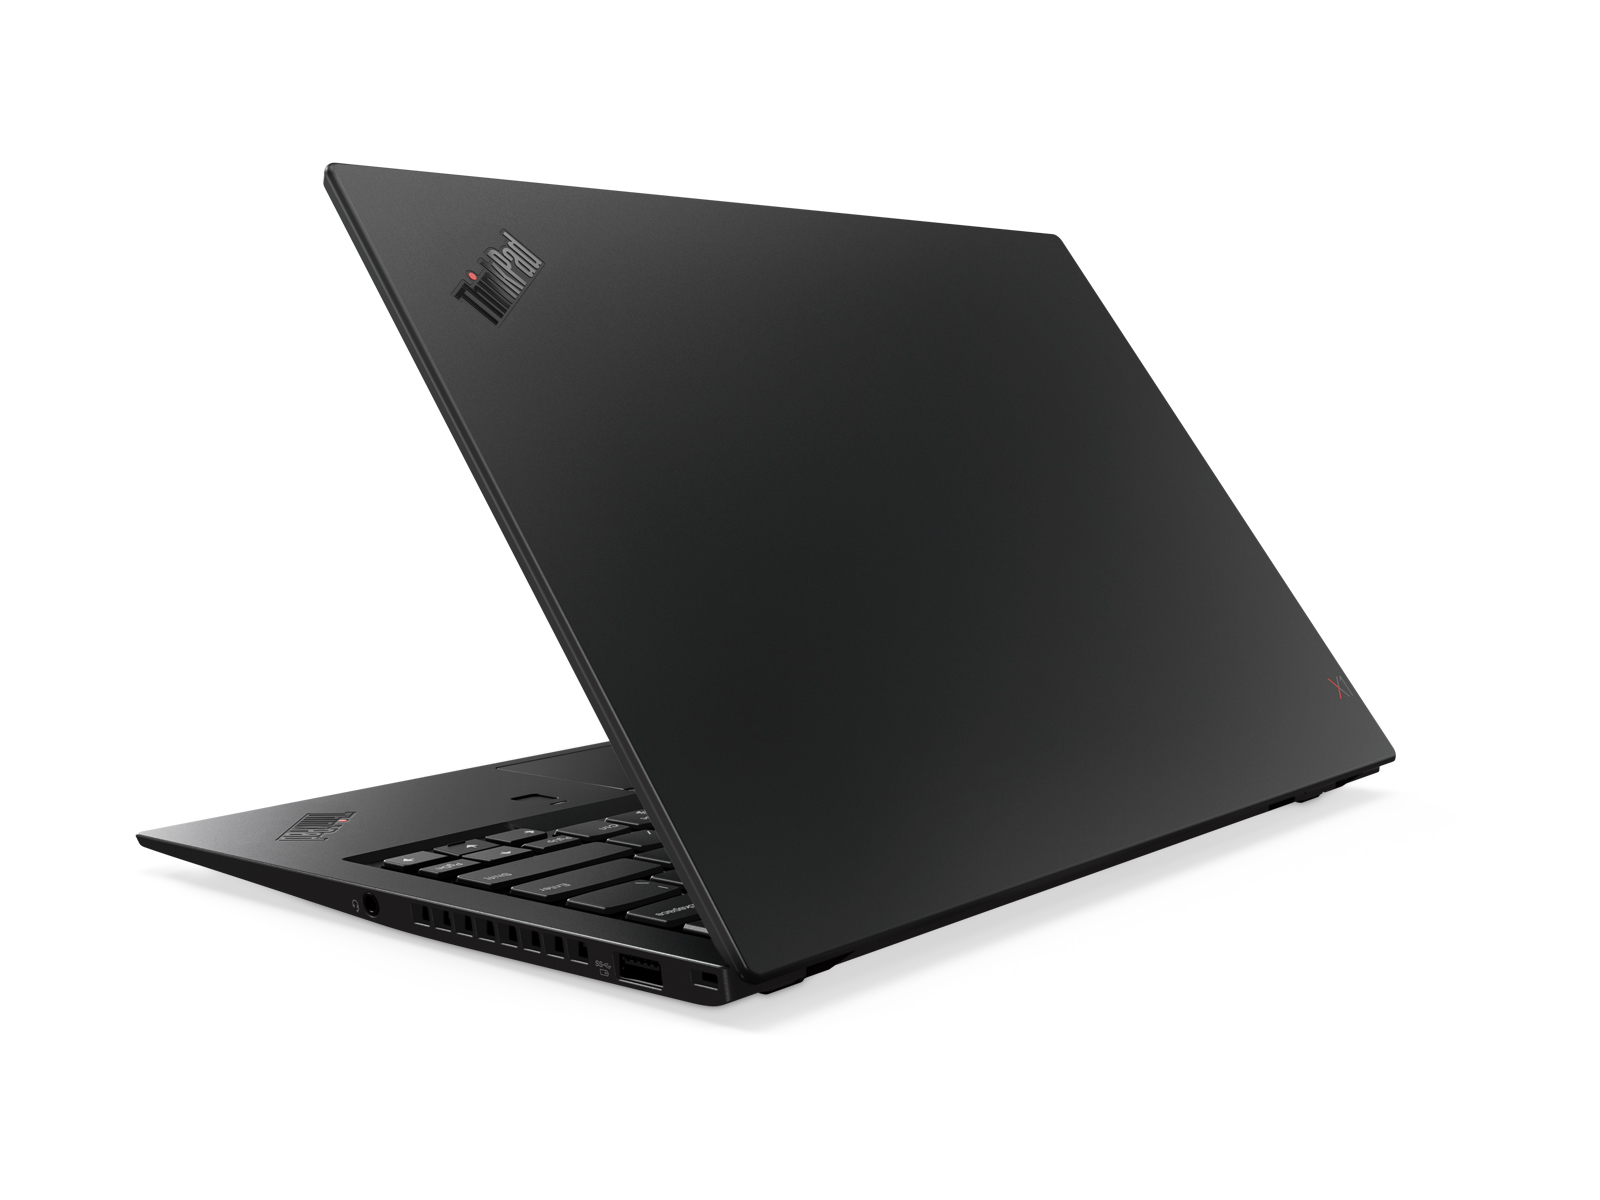 Lenovo ThinkPad X1 Carbon 2018 系列 - Notebookcheck